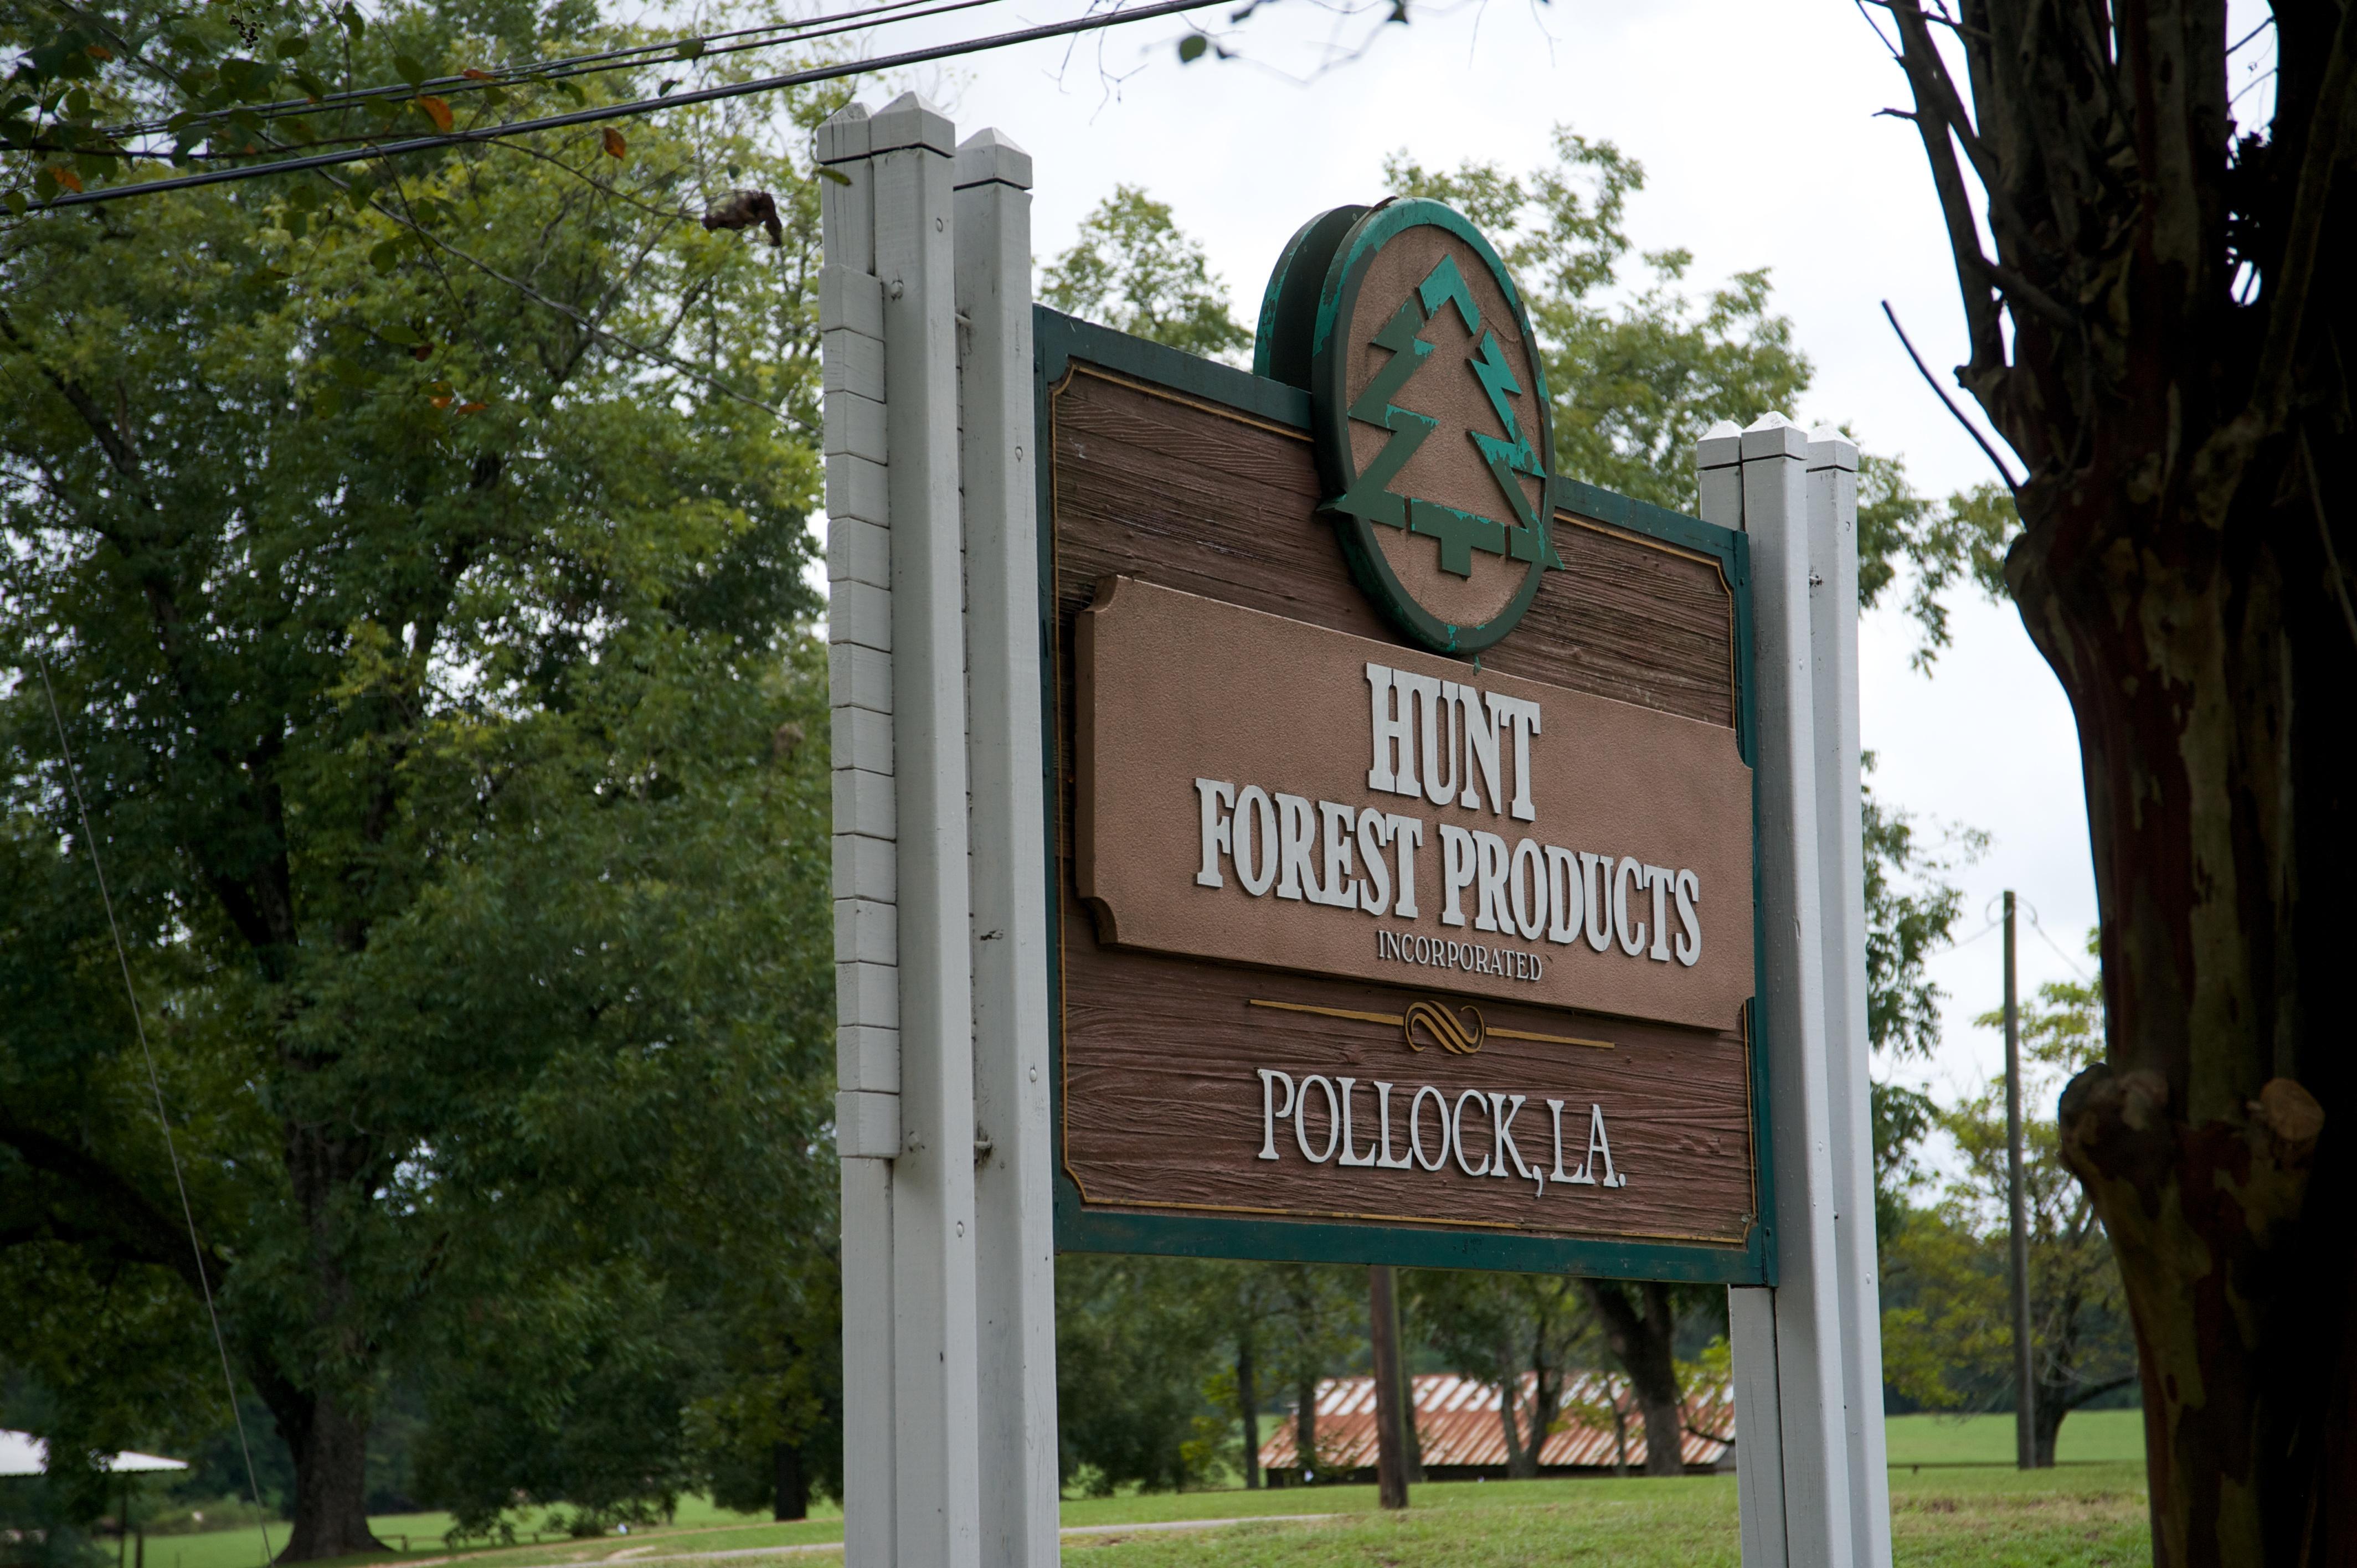 Welcome to HFP's Pollock, Louisiana facility!